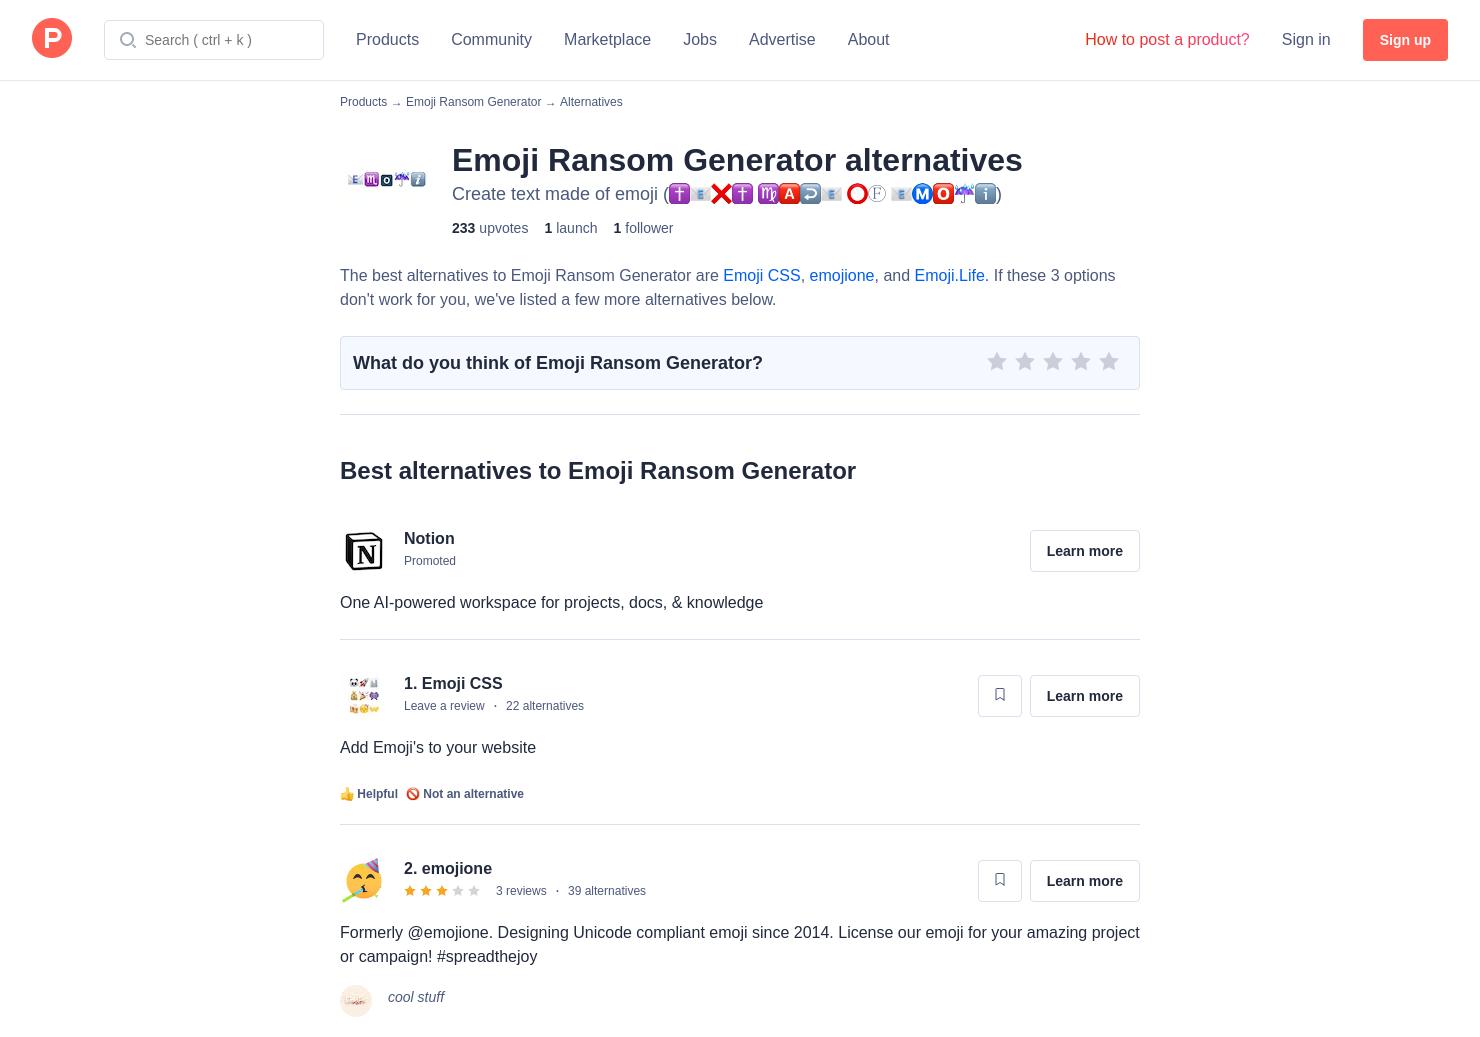 4 Alternatives to Emoji Ransom Generator | Product Hunt